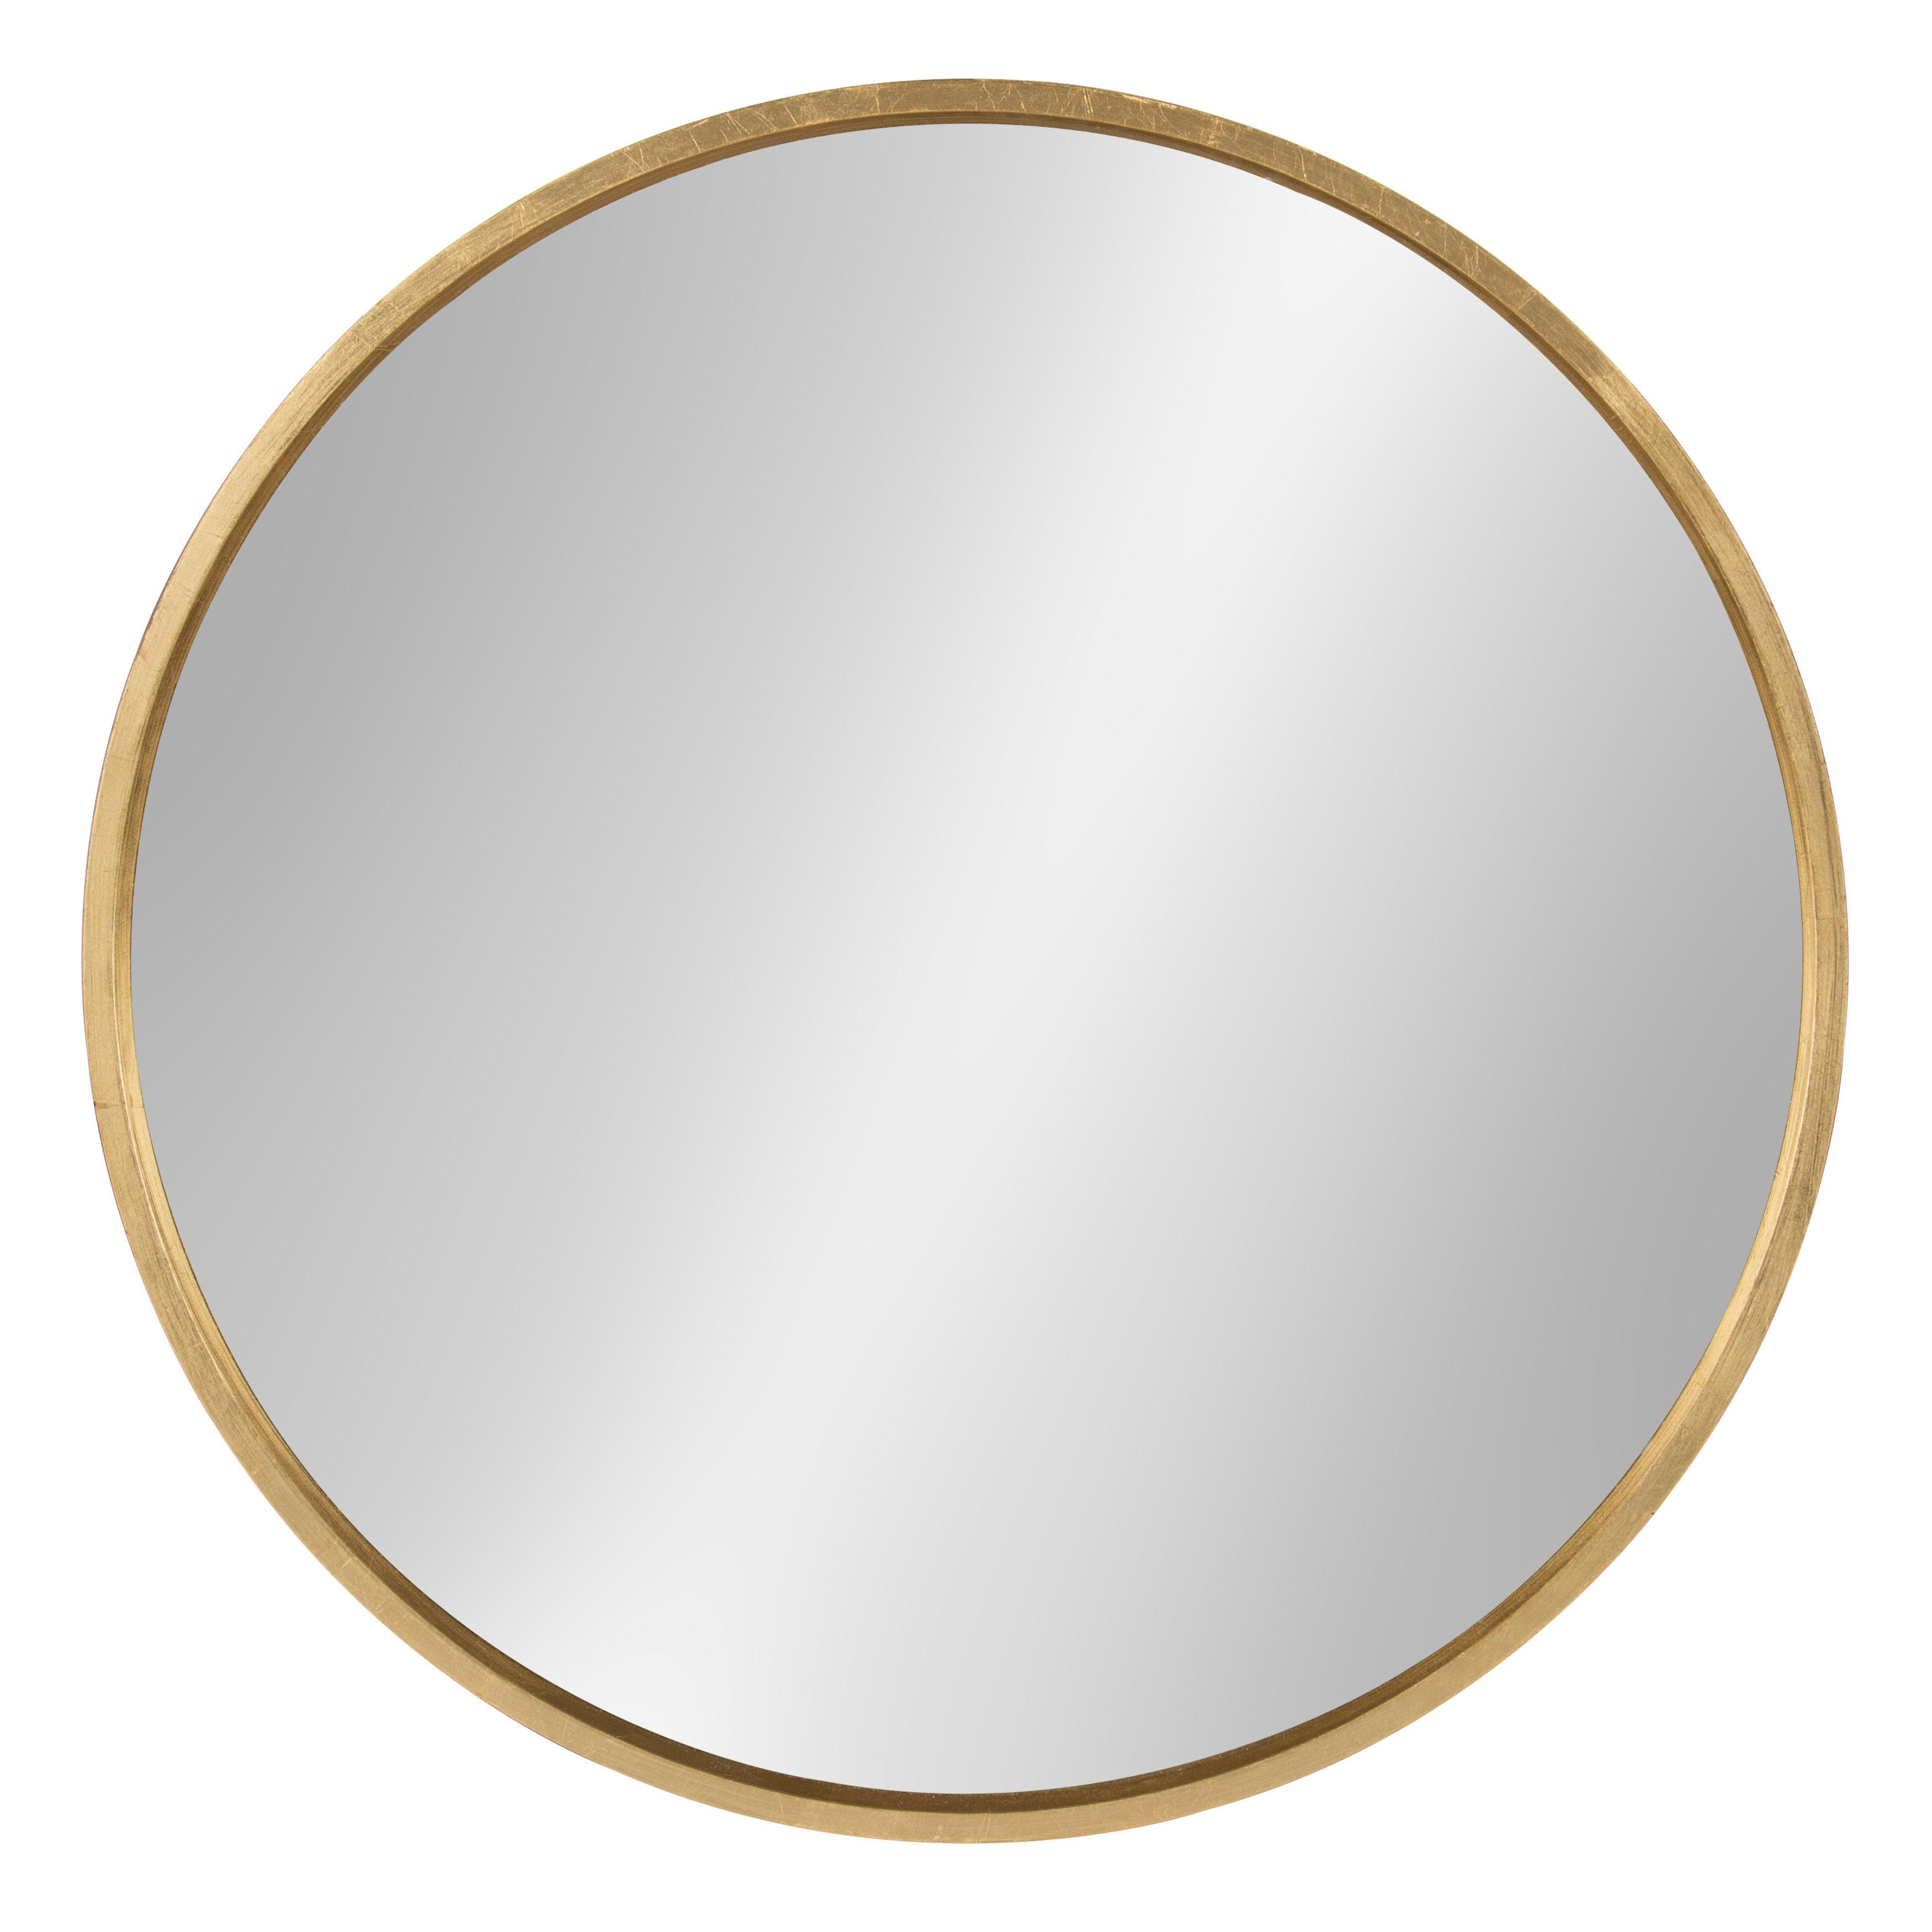 Tanner Accent Mirror Regarding Matthias Round Accent Mirrors (View 17 of 20)